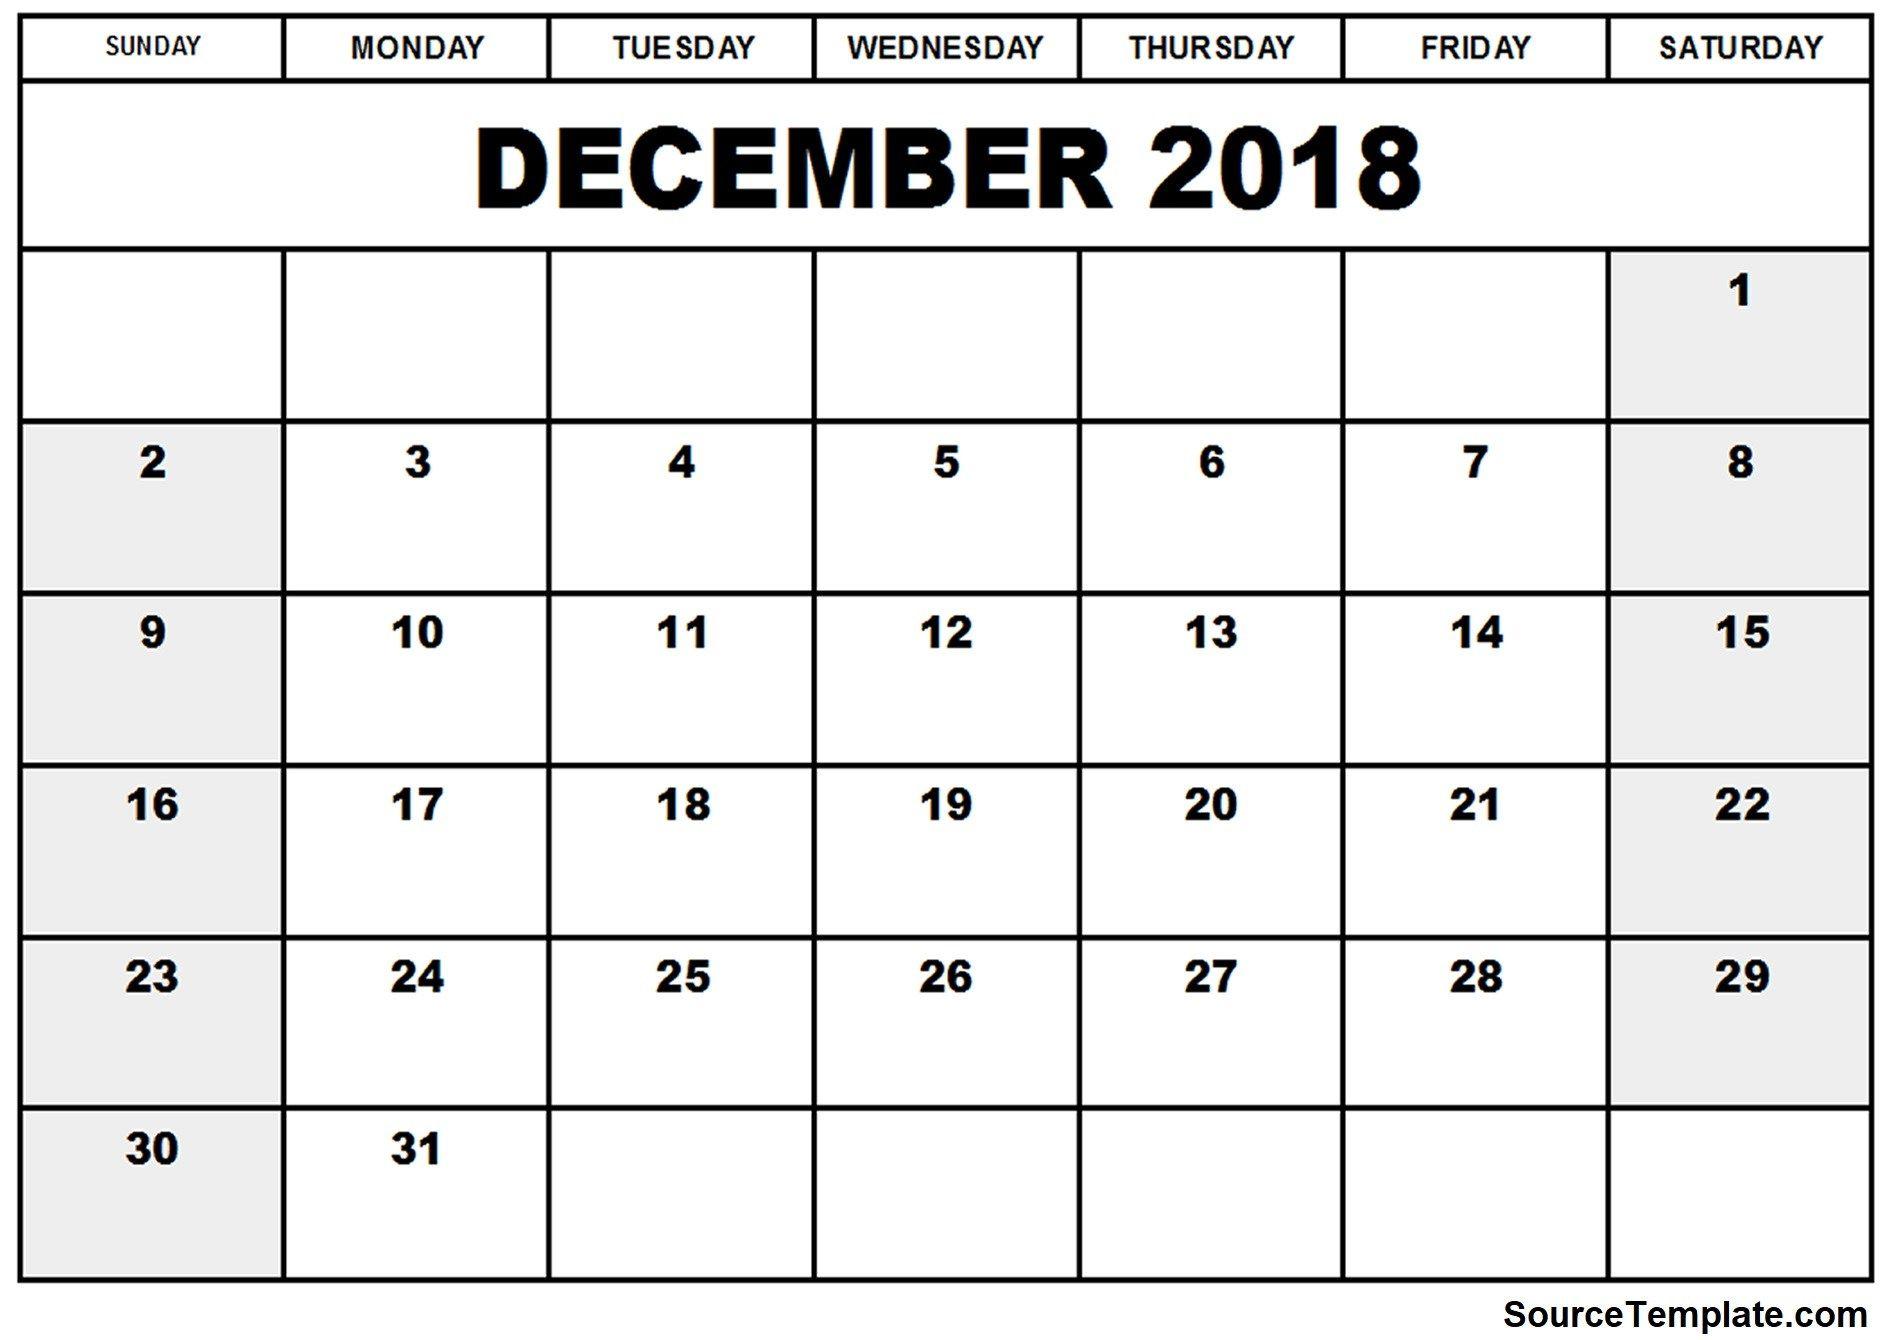 Free 5 December 2018 Calendar Printable Template November